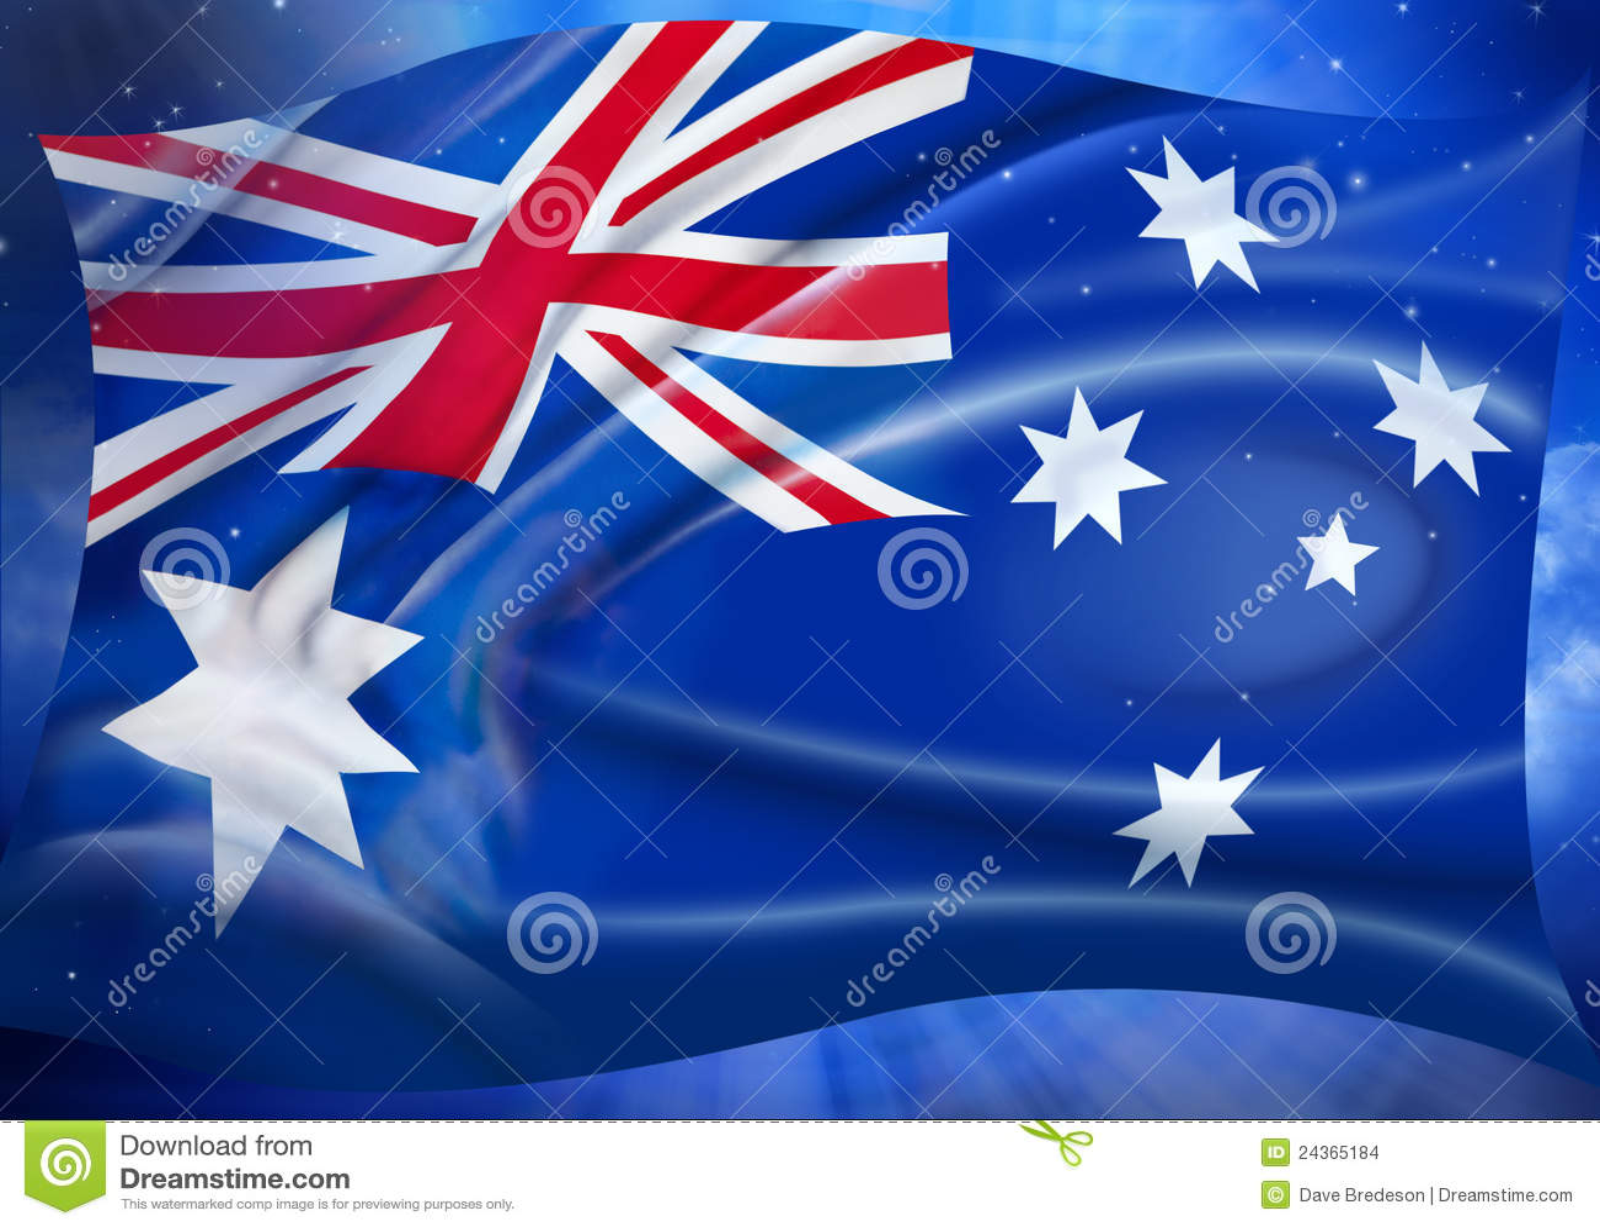 australian flag sky stars background stock images image 24365184